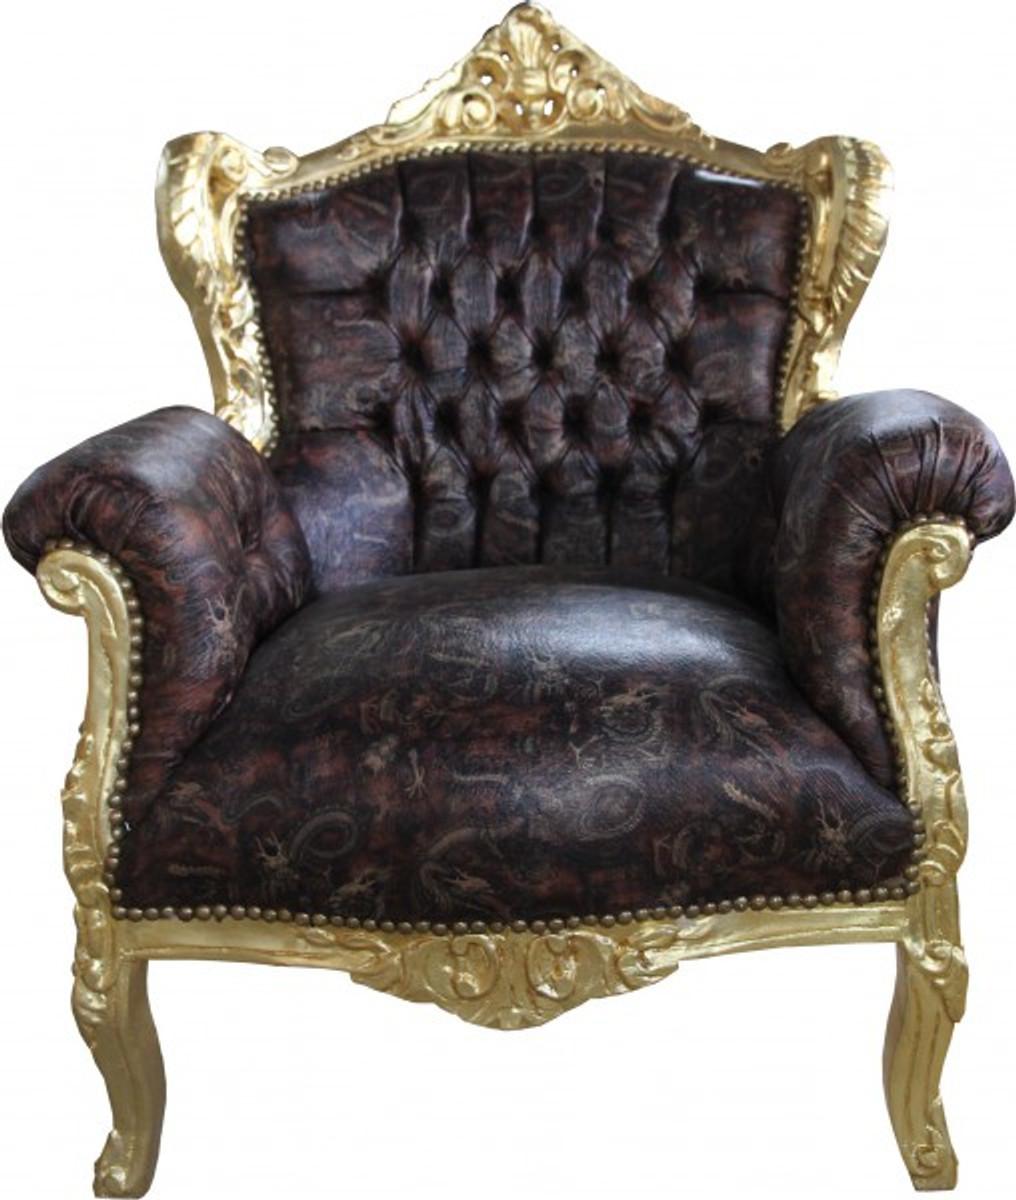 casa padrino barock sessel lord braun gold lederoptik antik stil sessel barock sessel modell. Black Bedroom Furniture Sets. Home Design Ideas